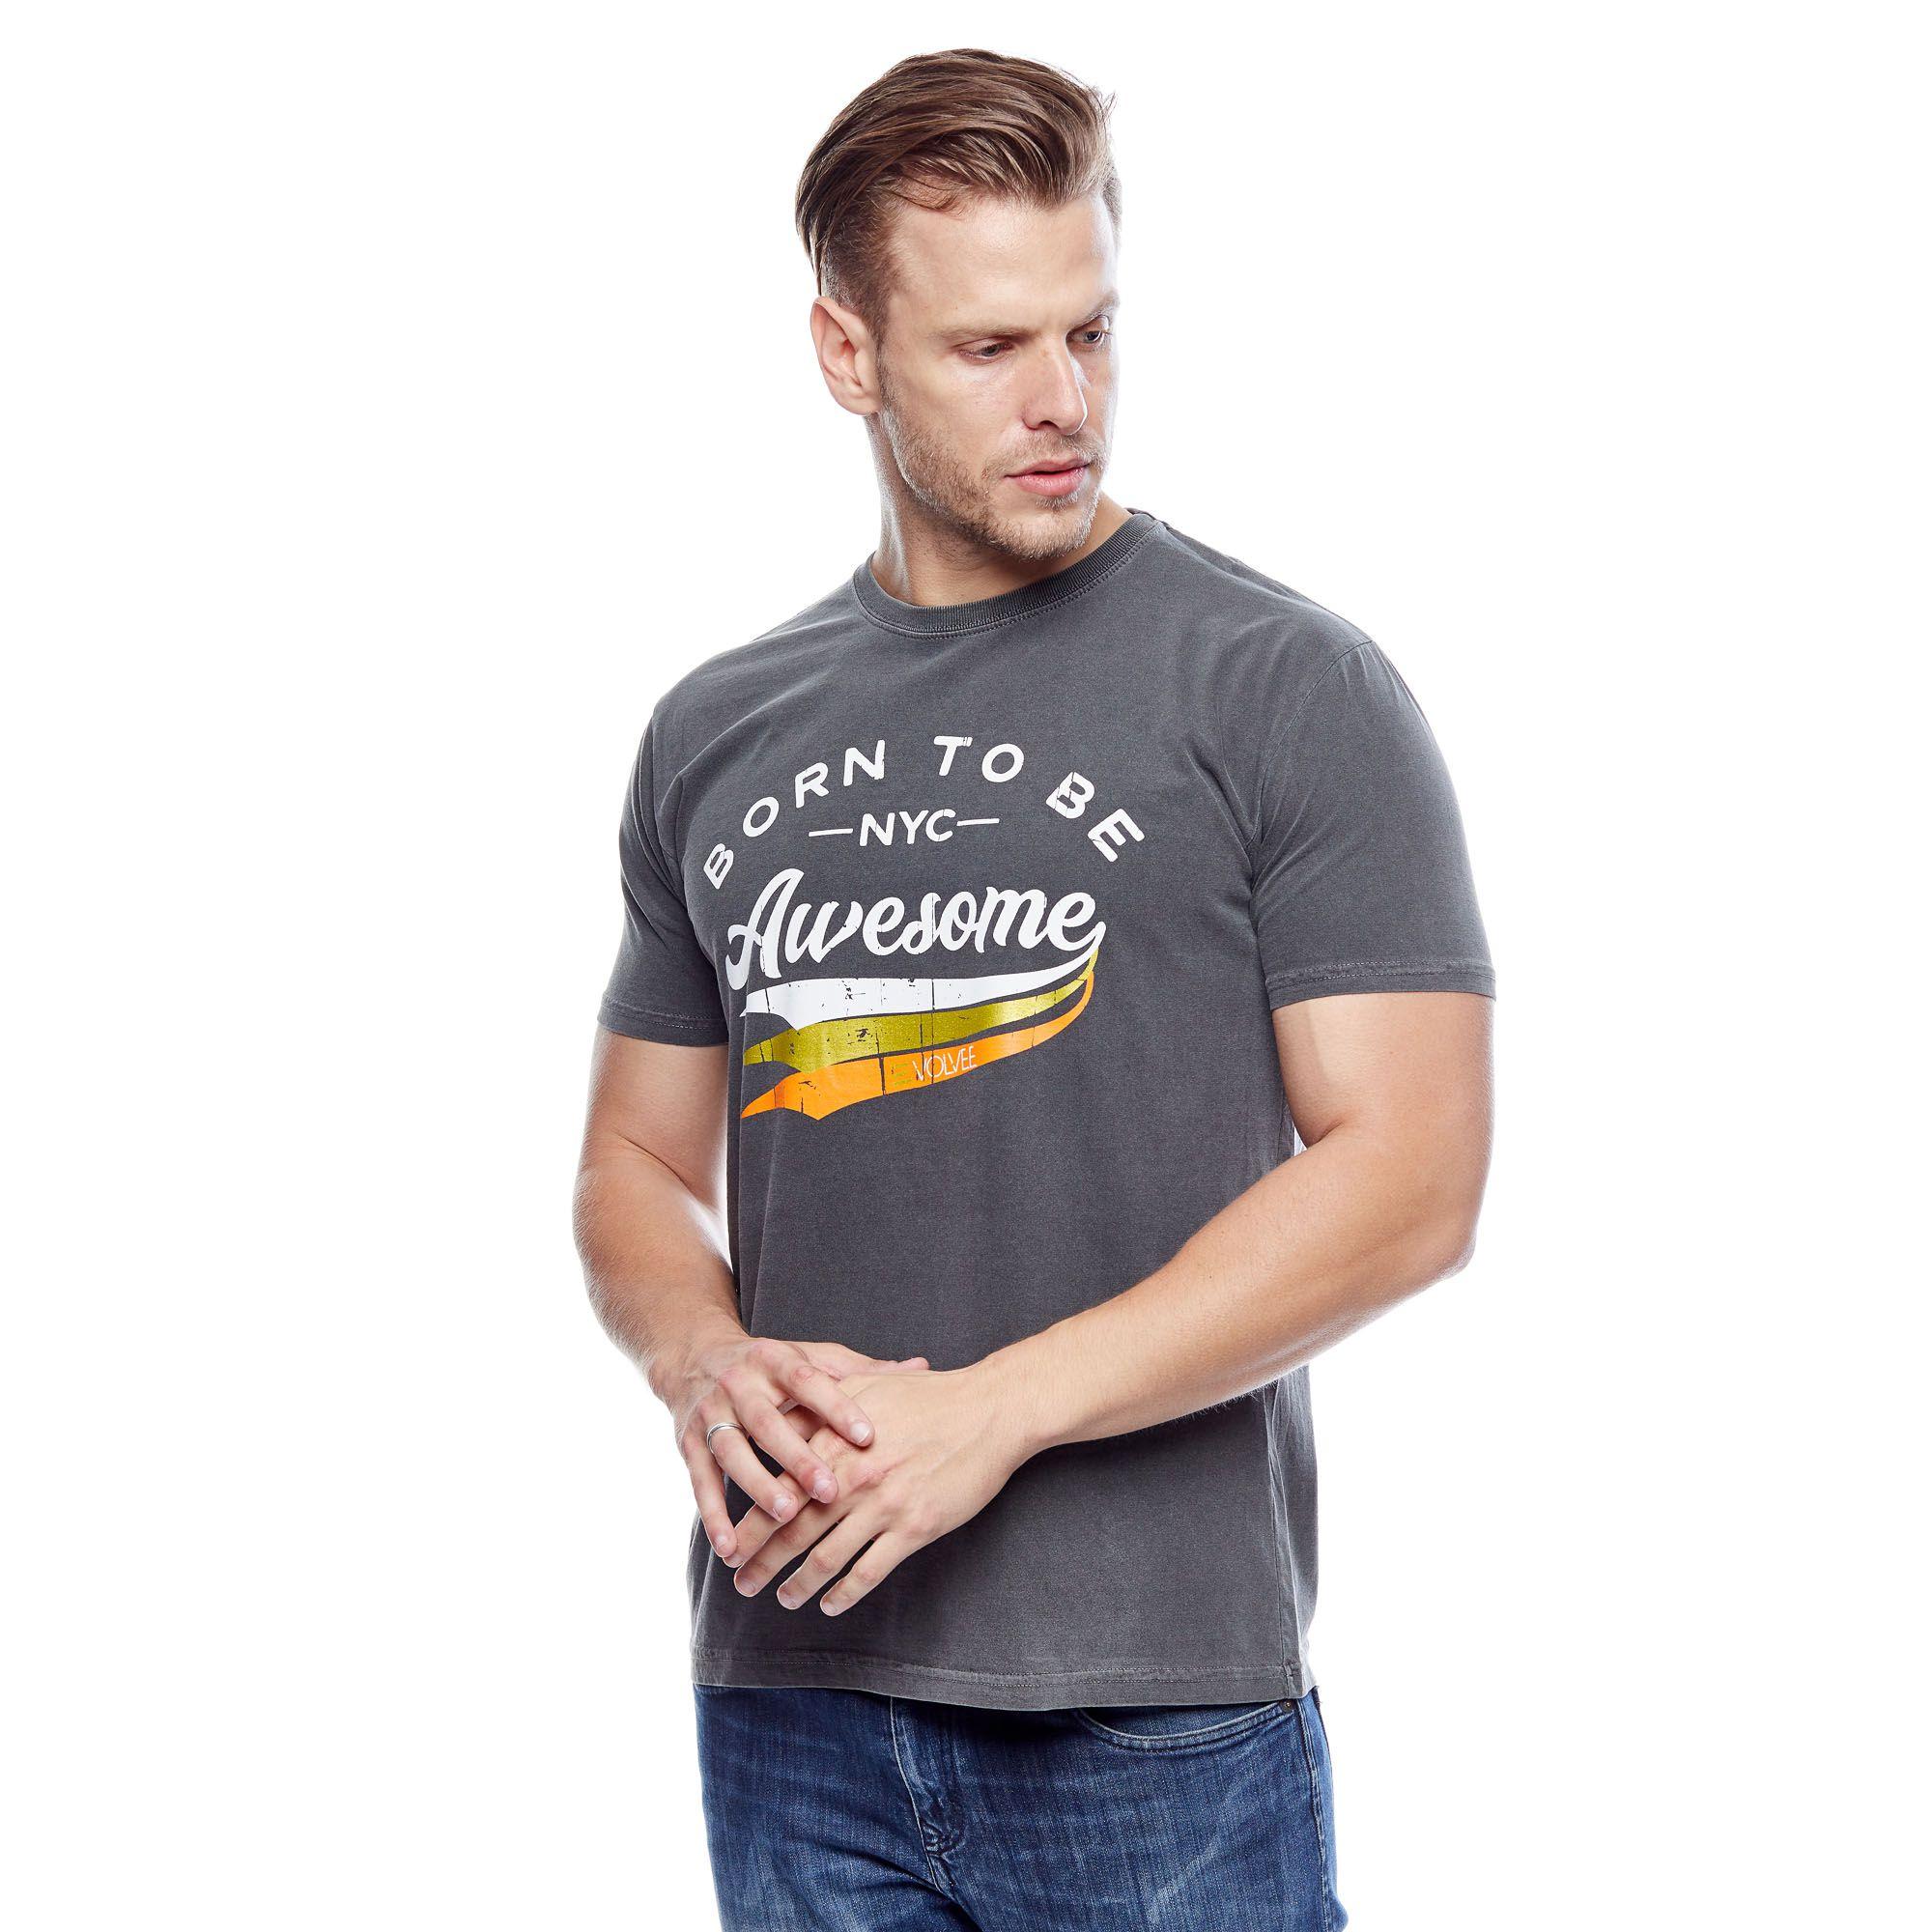 Camiseta Awesome Masculina Evolvee